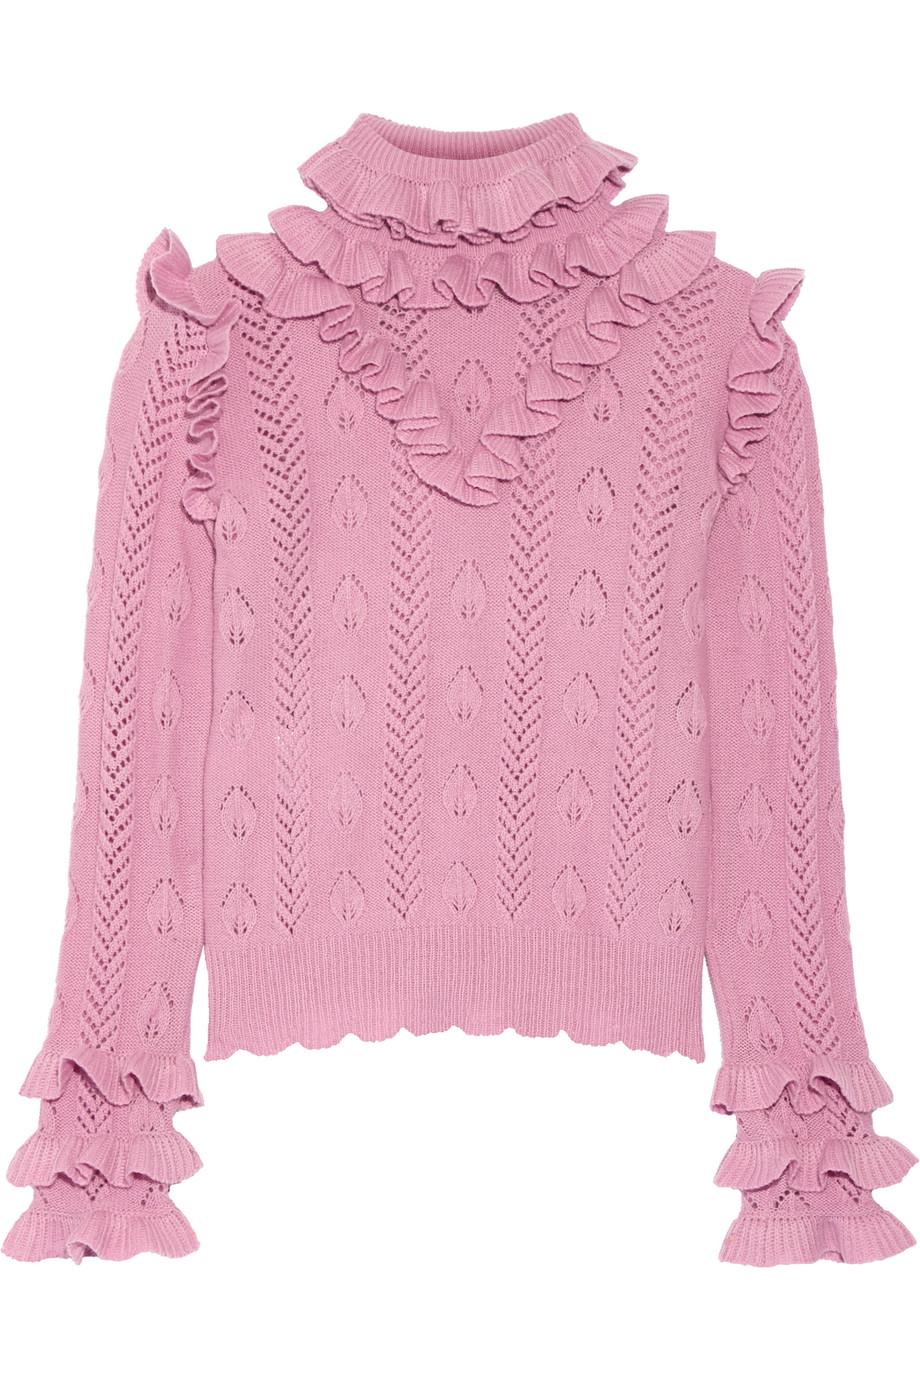 Gucci Ruffled Pointelle-Knit Wool-Blend Sweater, Baby Pink, Women's, Size: XL